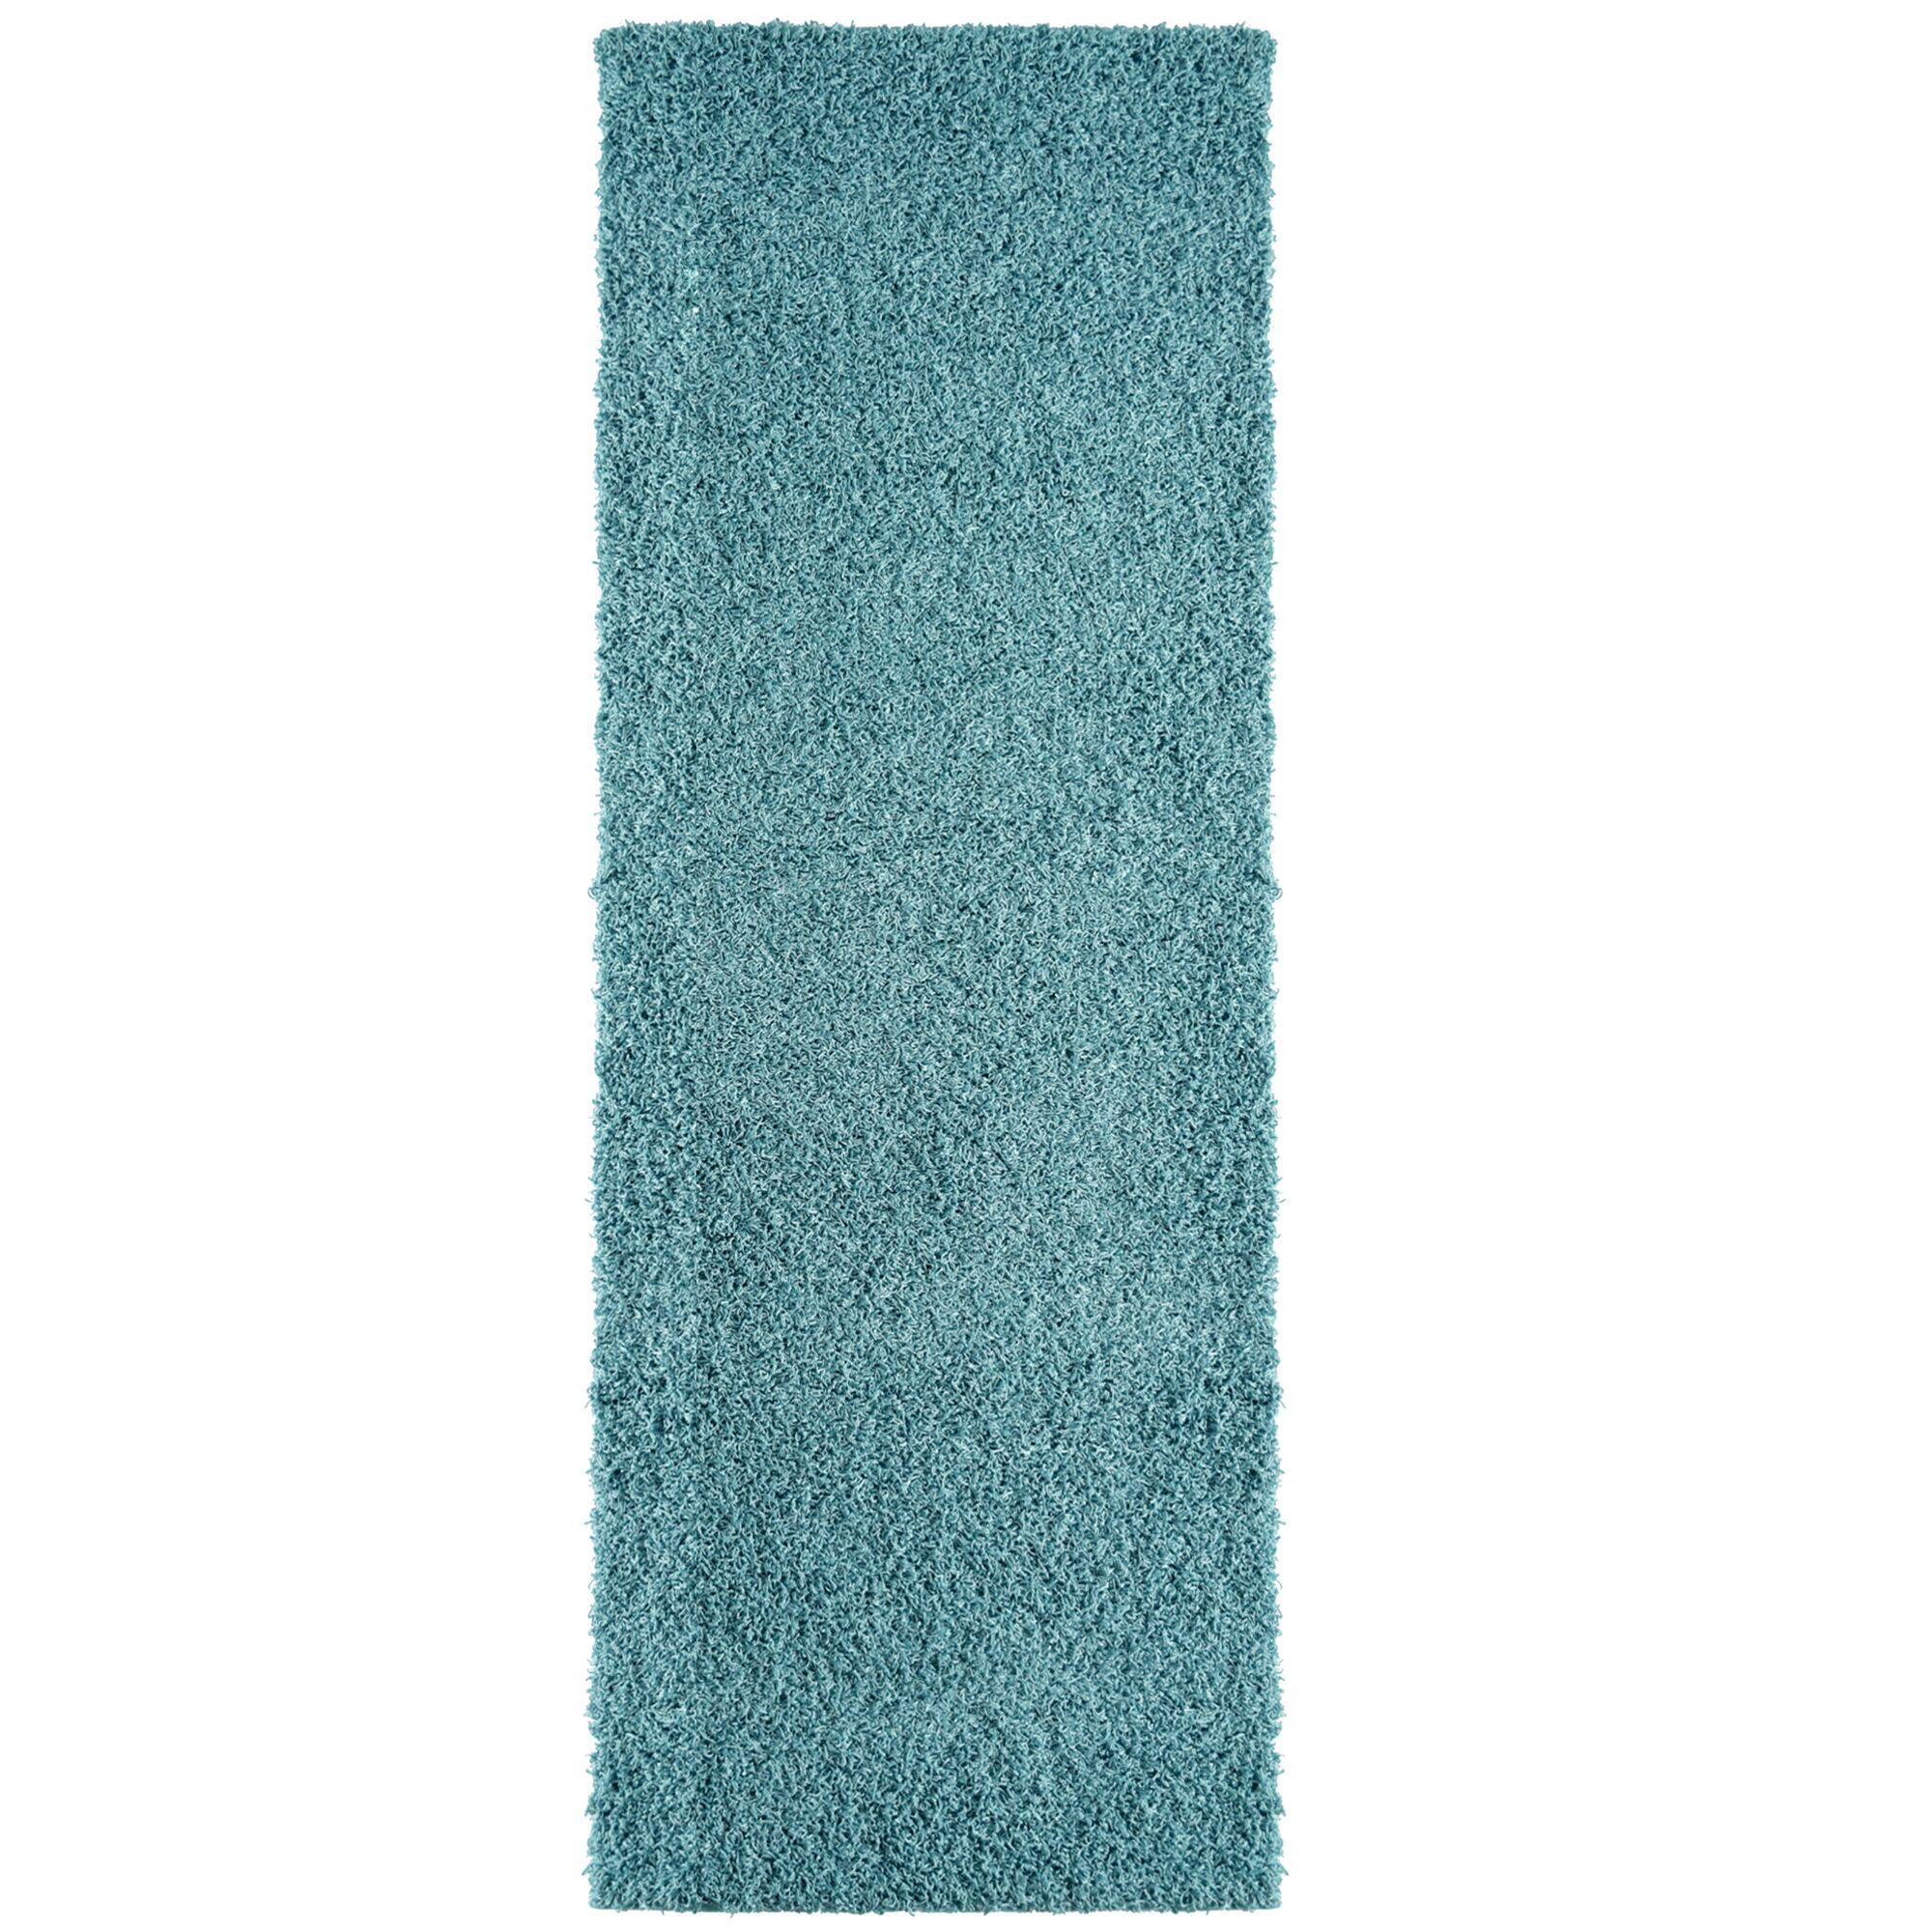 Modern Shag Polyester Aqua Blue Indoor Area Rug Rug Size: 5' x 7'